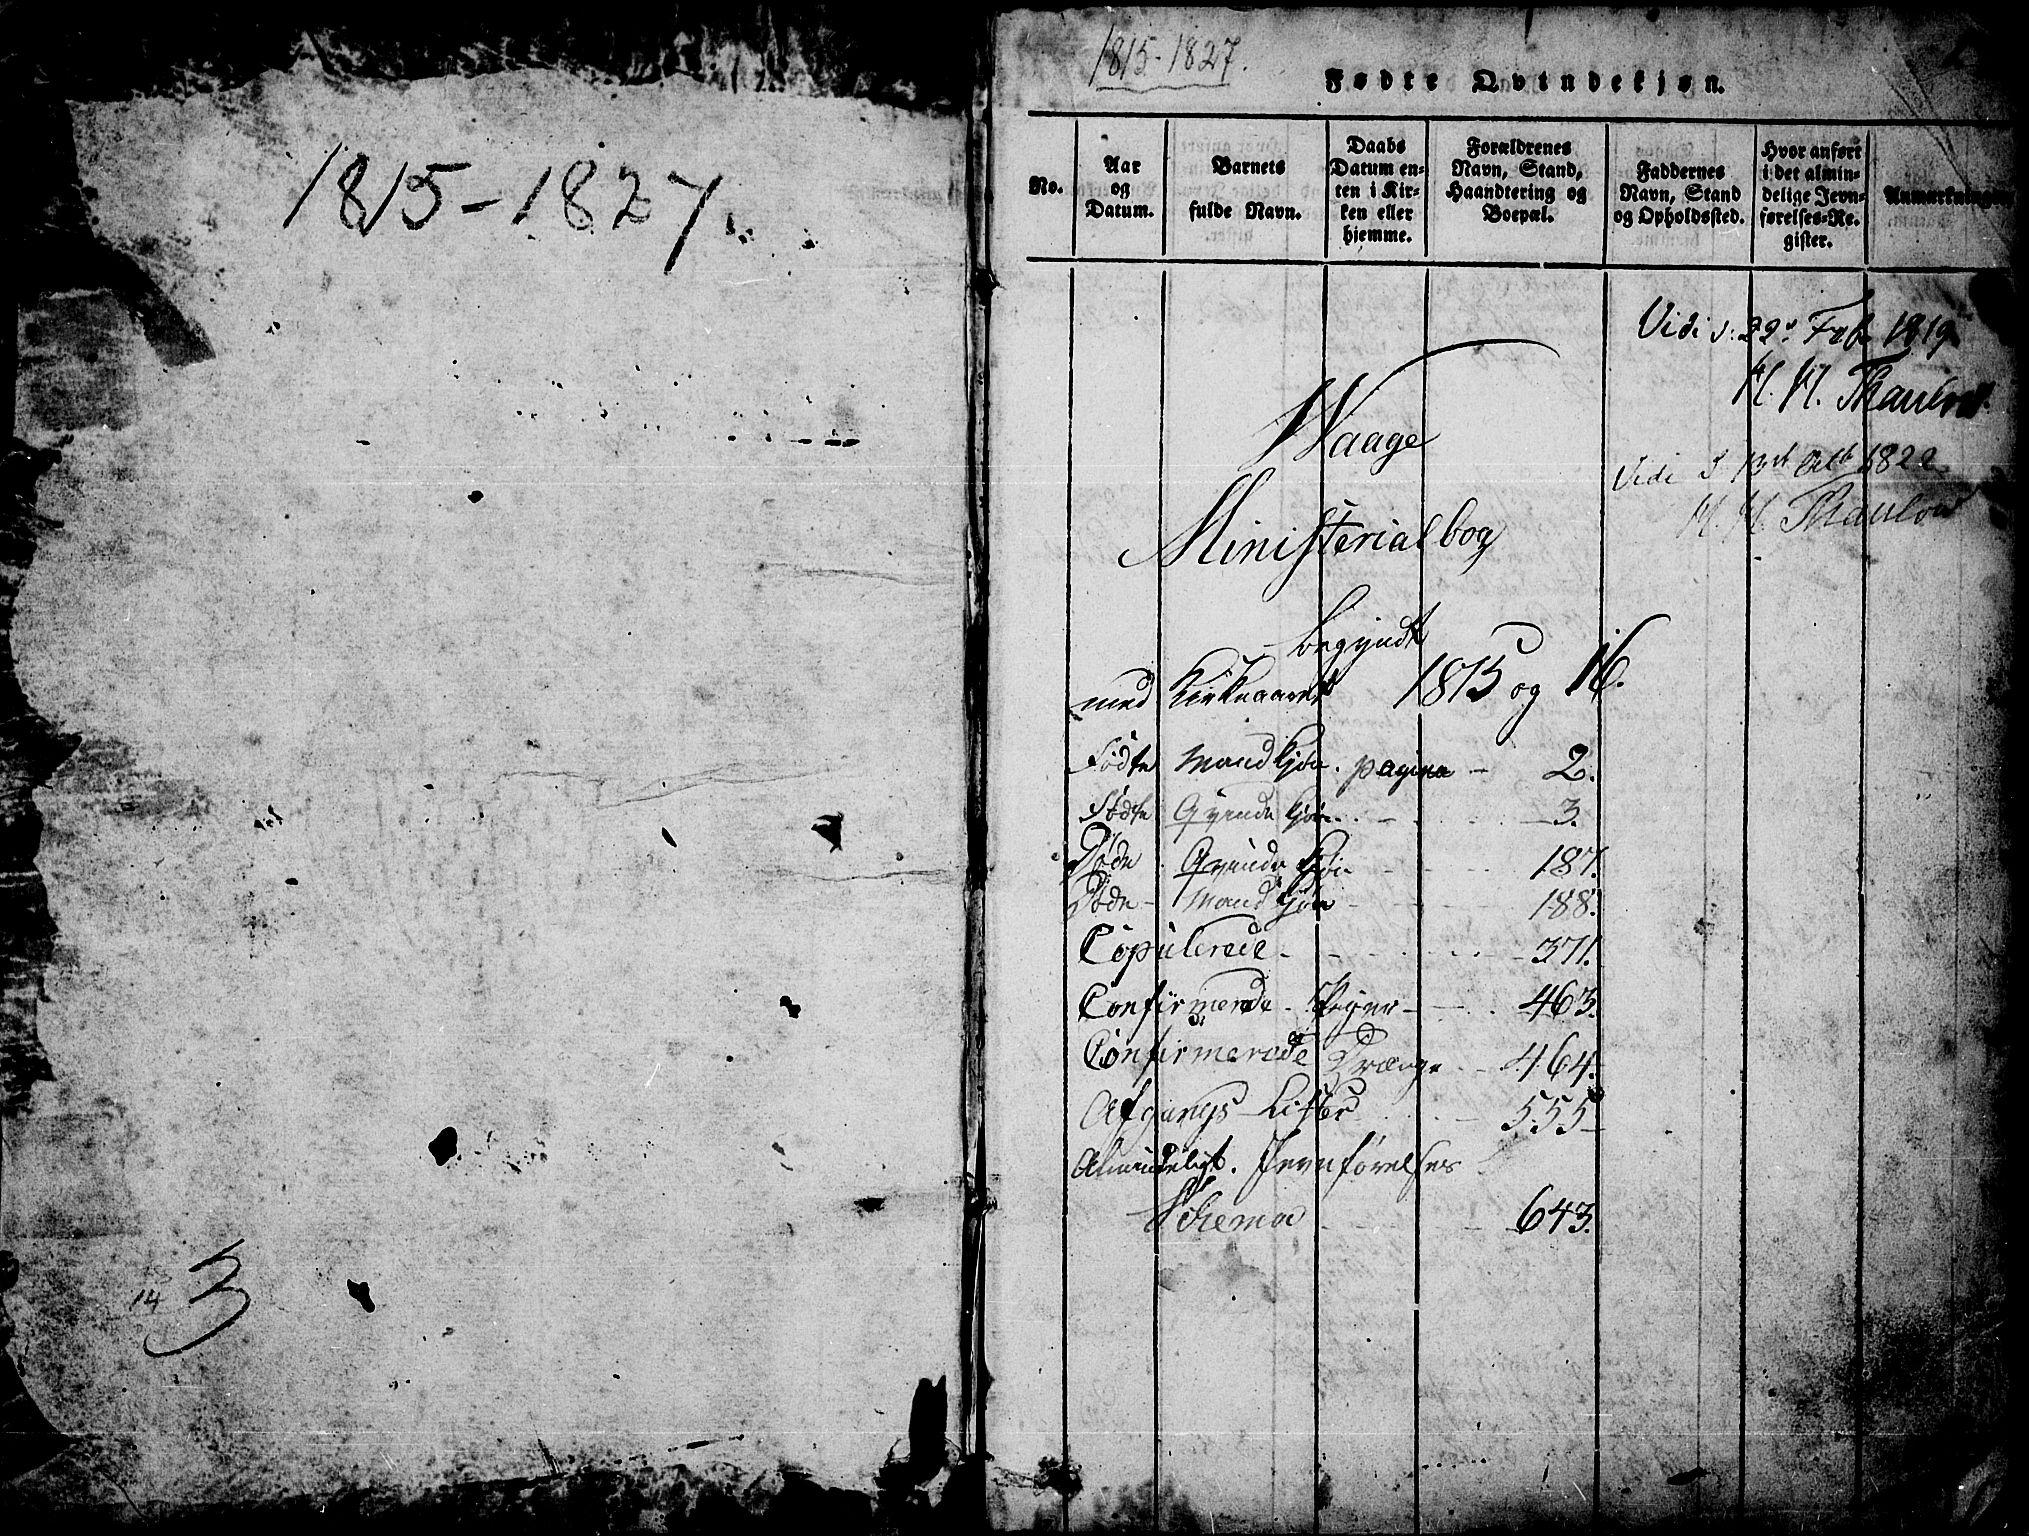 SAH, Vågå prestekontor, Ministerialbok nr. 3, 1815-1827, s. 0-1